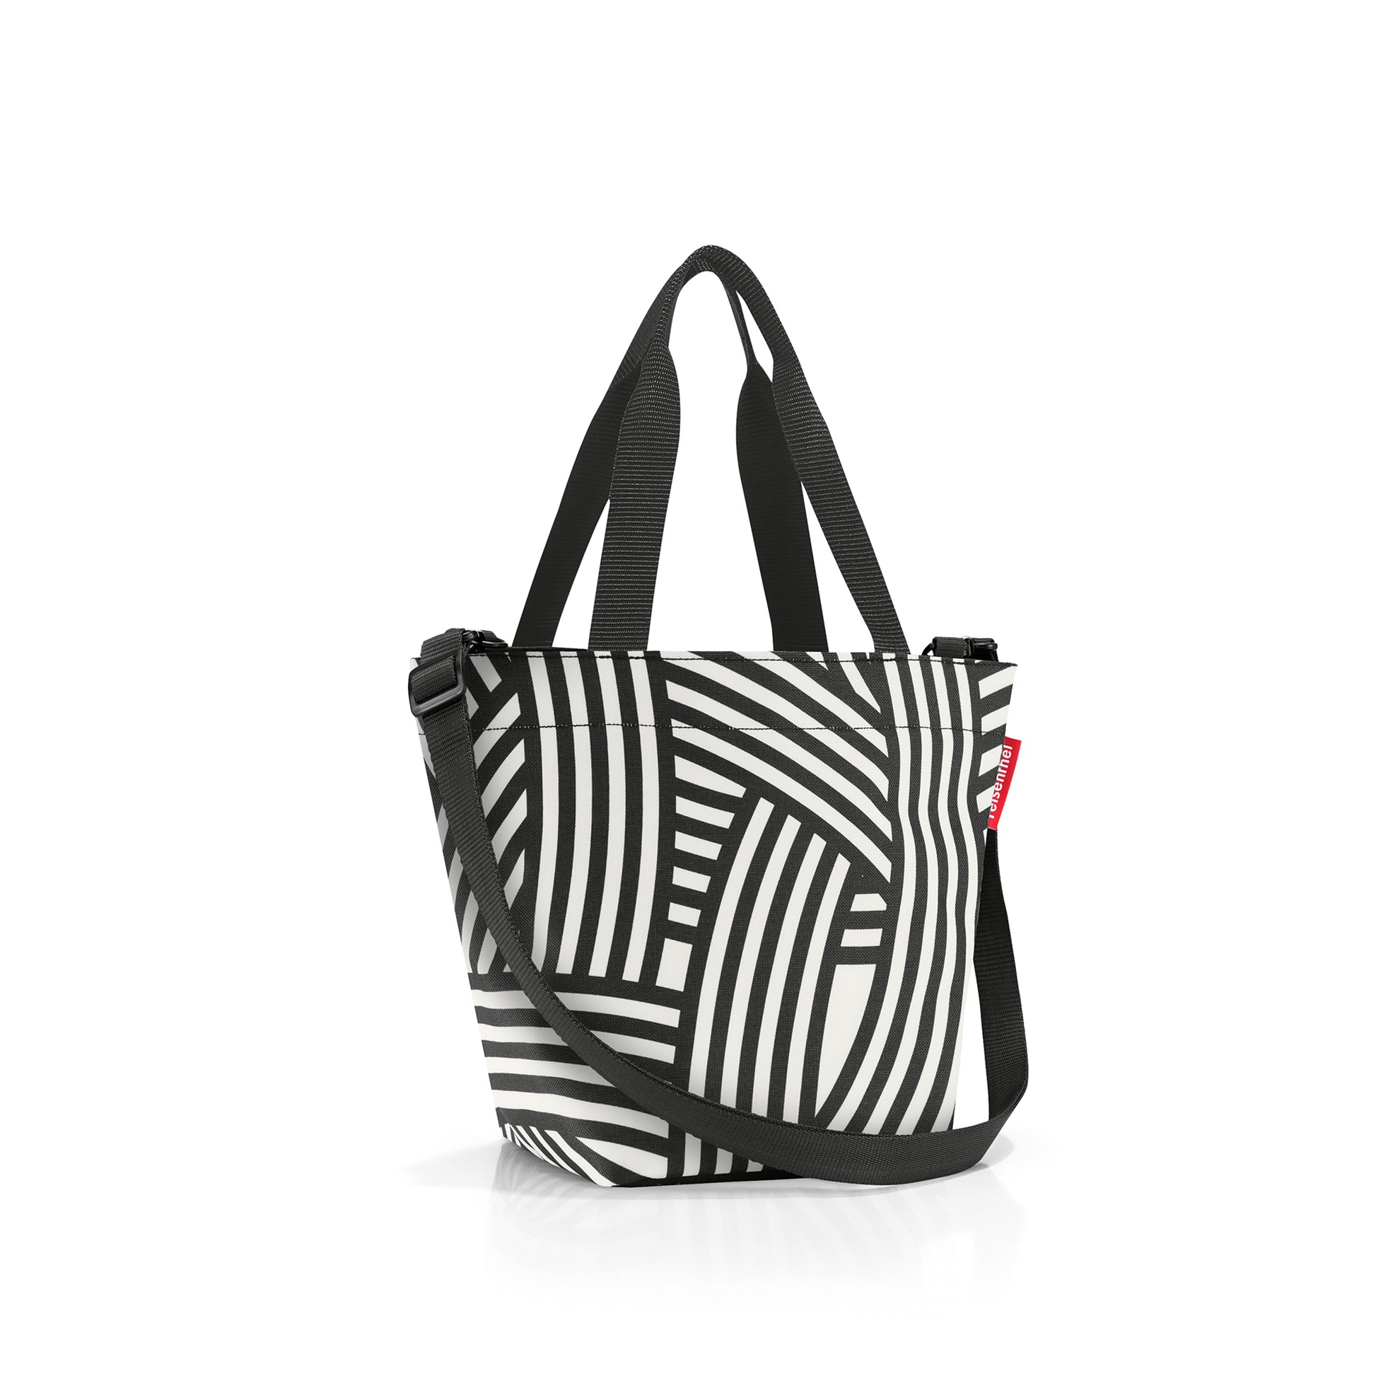 Taška/kabelka Shopper XS zebra_0